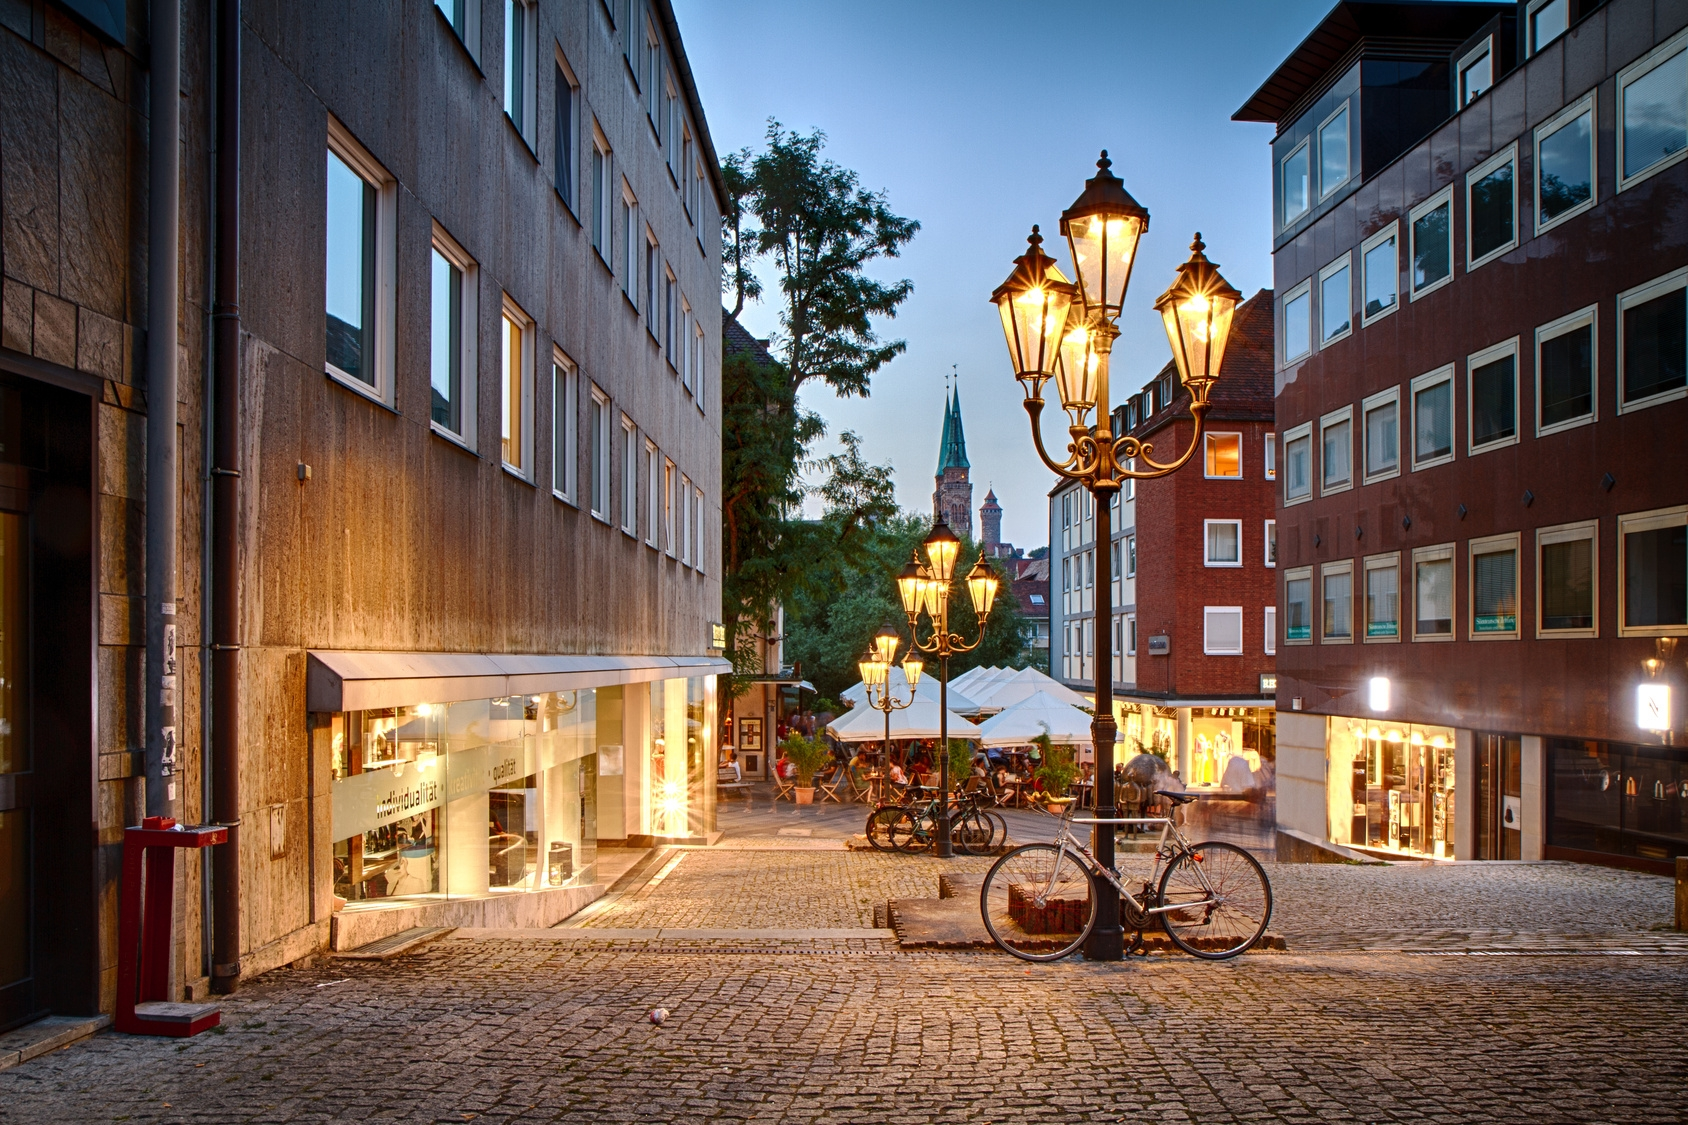 Bamberga , Munique , Nuremberg , Kulmbach